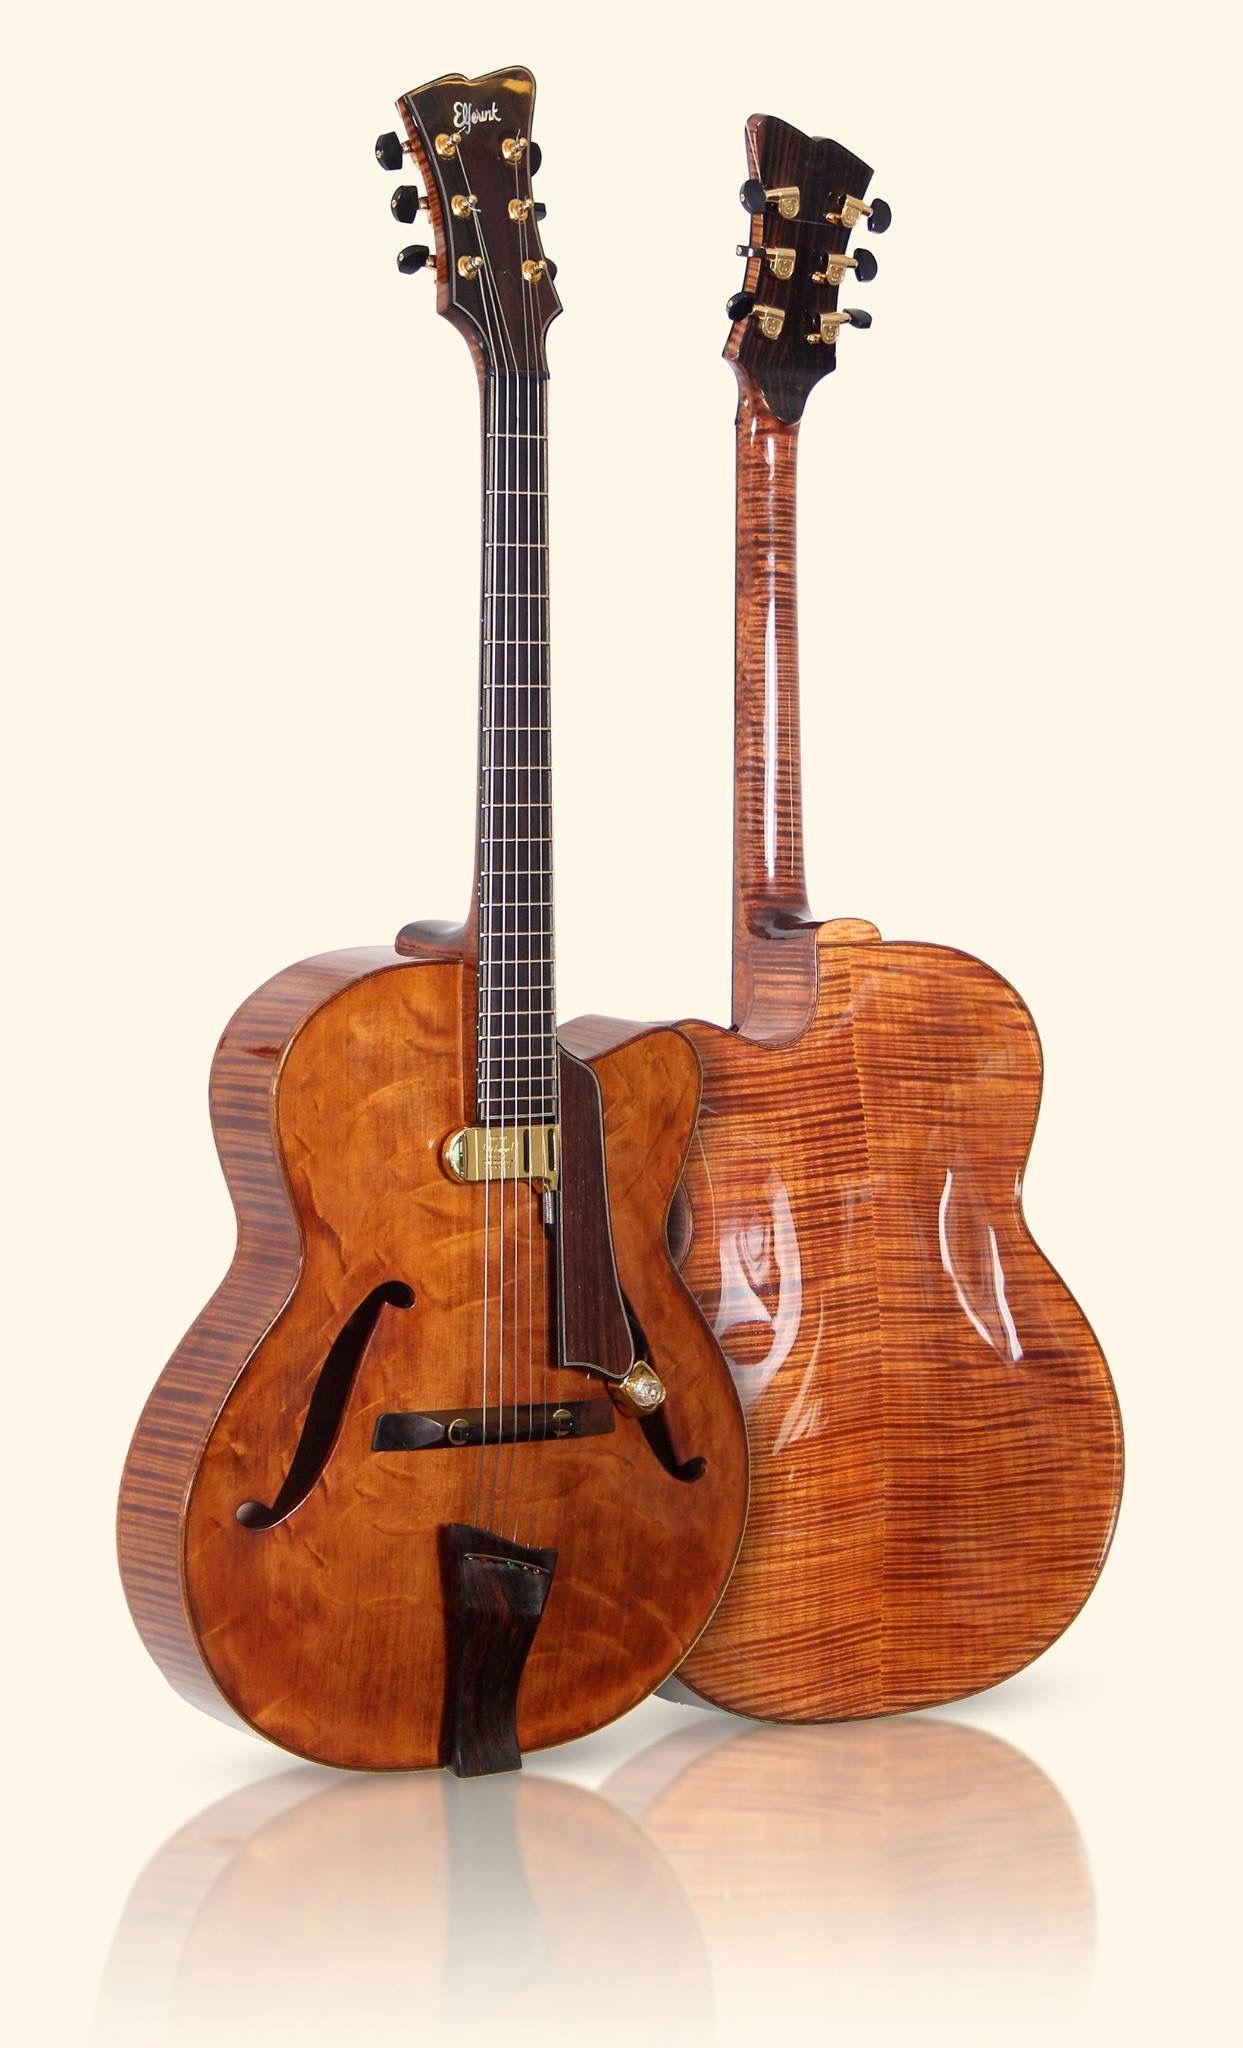 Elferink Acoustic Guitar Guitar Collection Acoustic Guitar Pictures